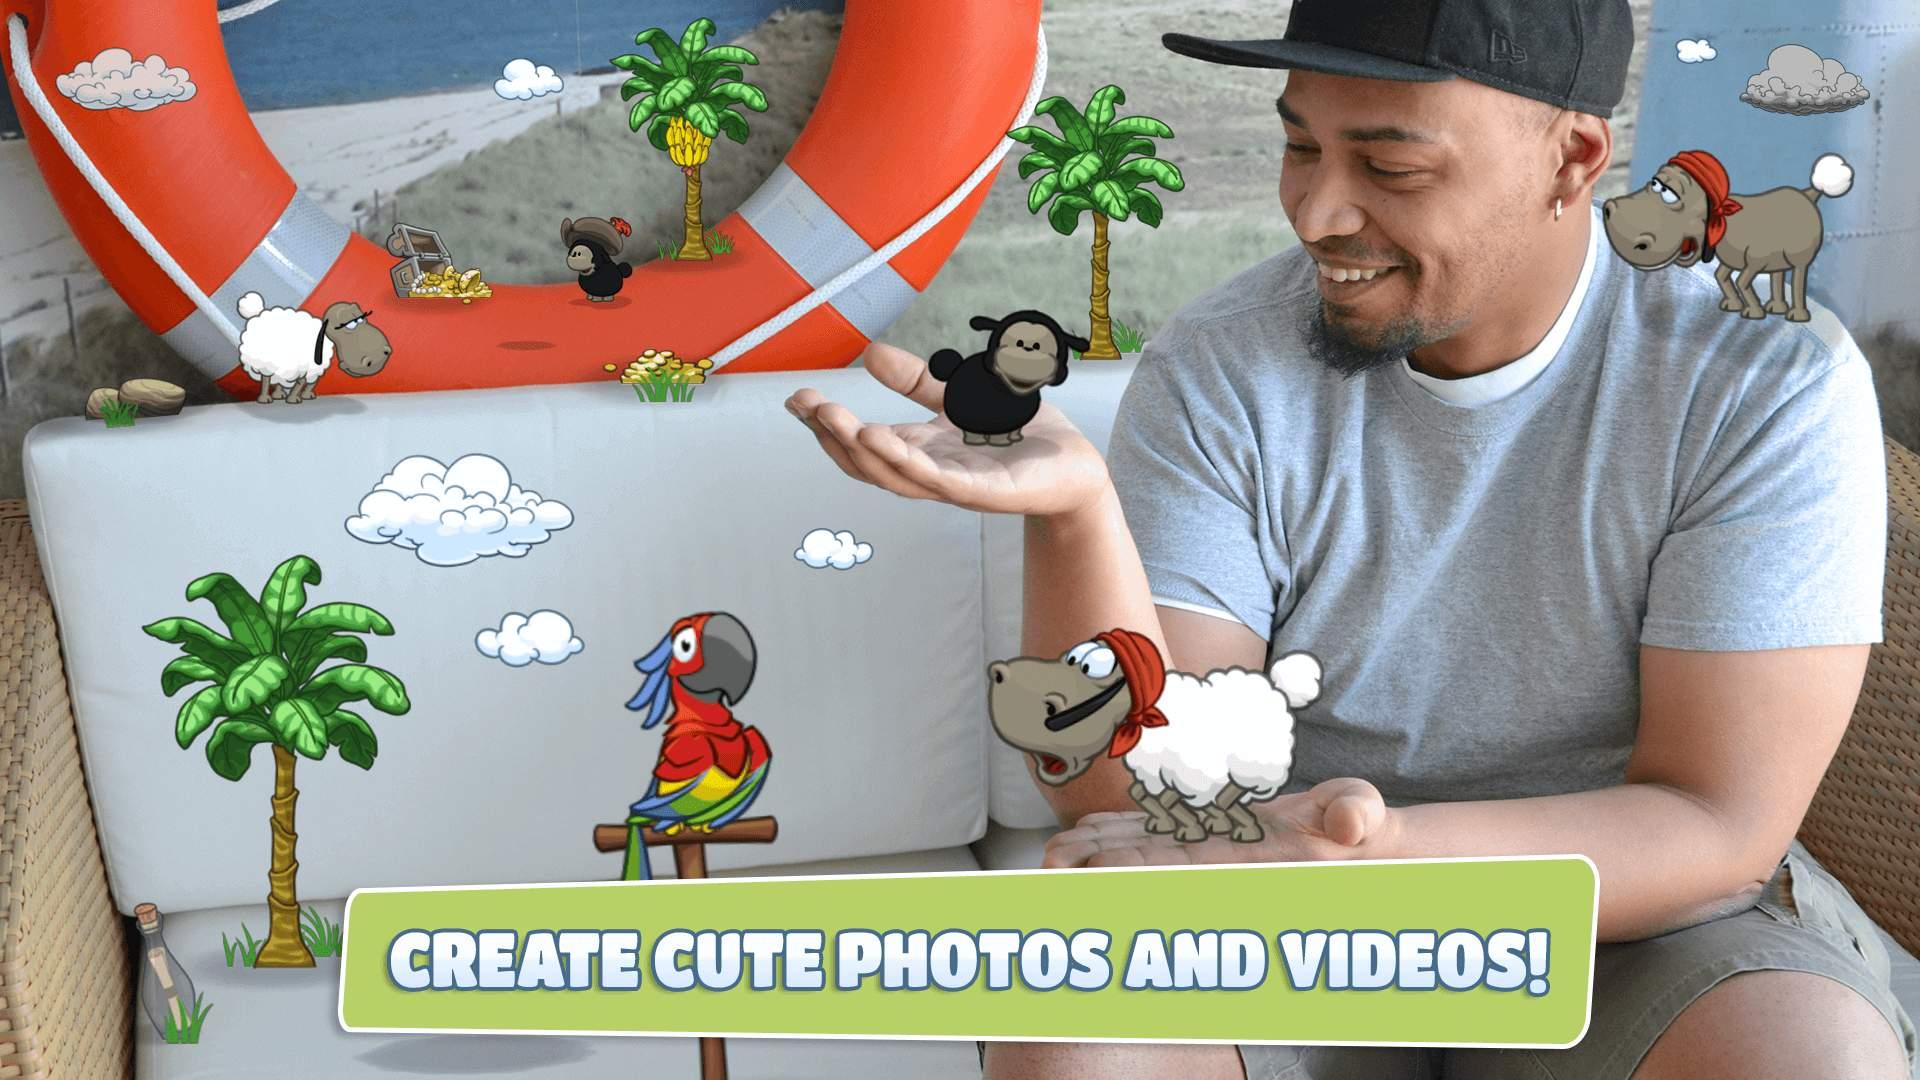 Clouds & Sheep AR Effects Screenshot 01